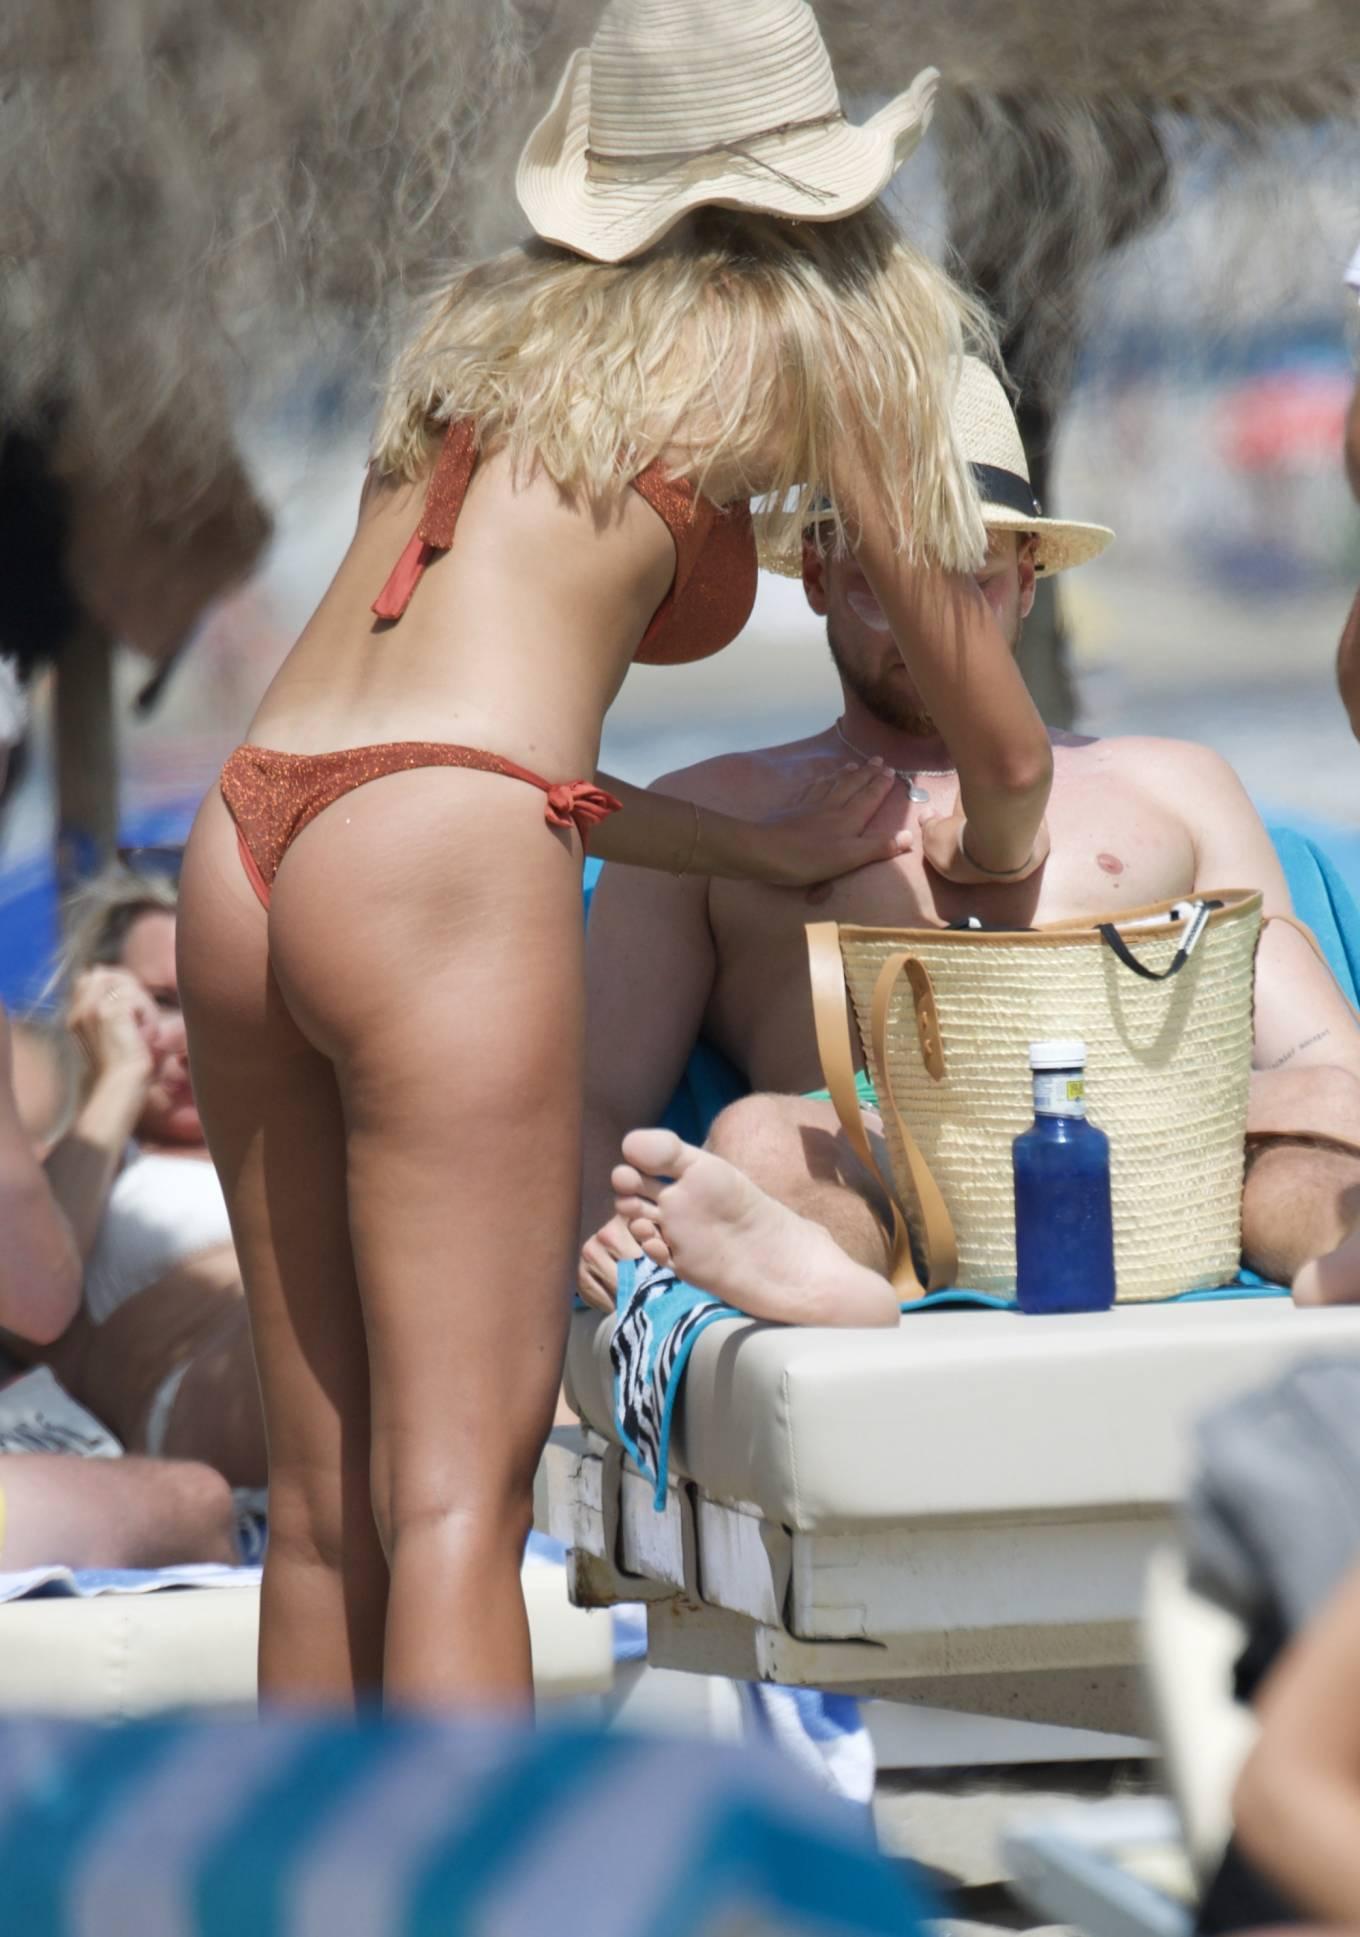 Zara McDermott 2020 : Zara McDermott in Bikini 2020-21